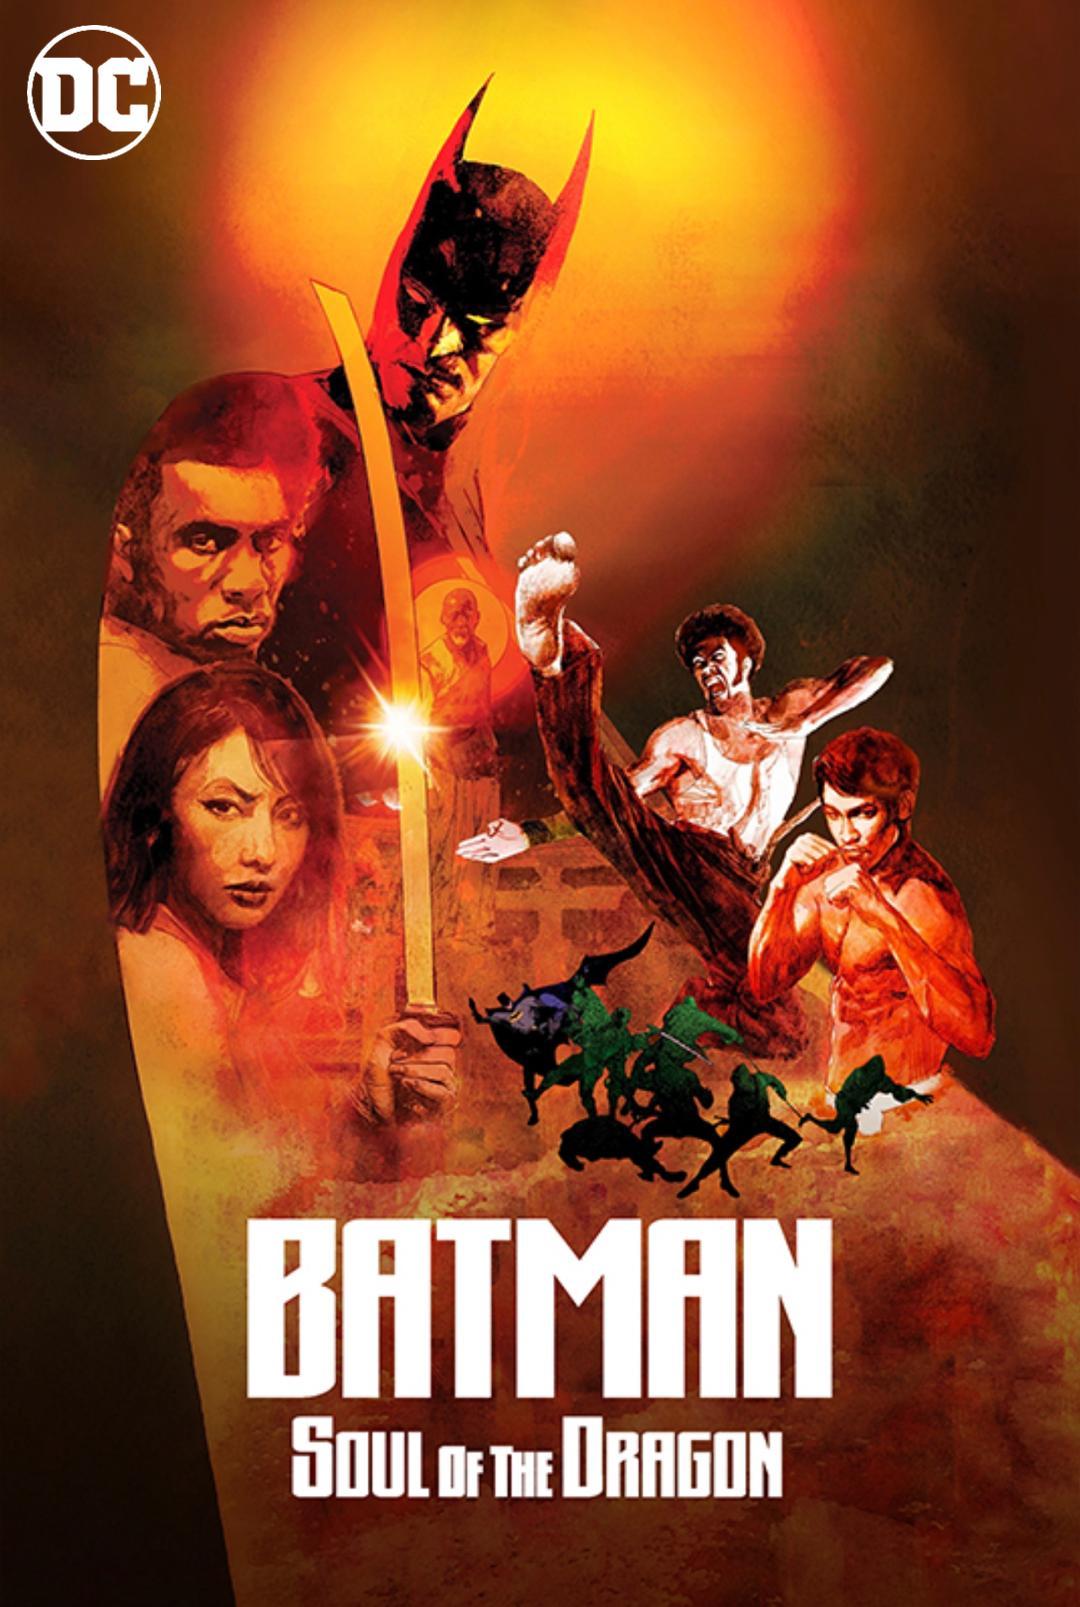 Batman Soul of the Dragon (2021) English 720p WEB-DL x264 AAC 700MB Download